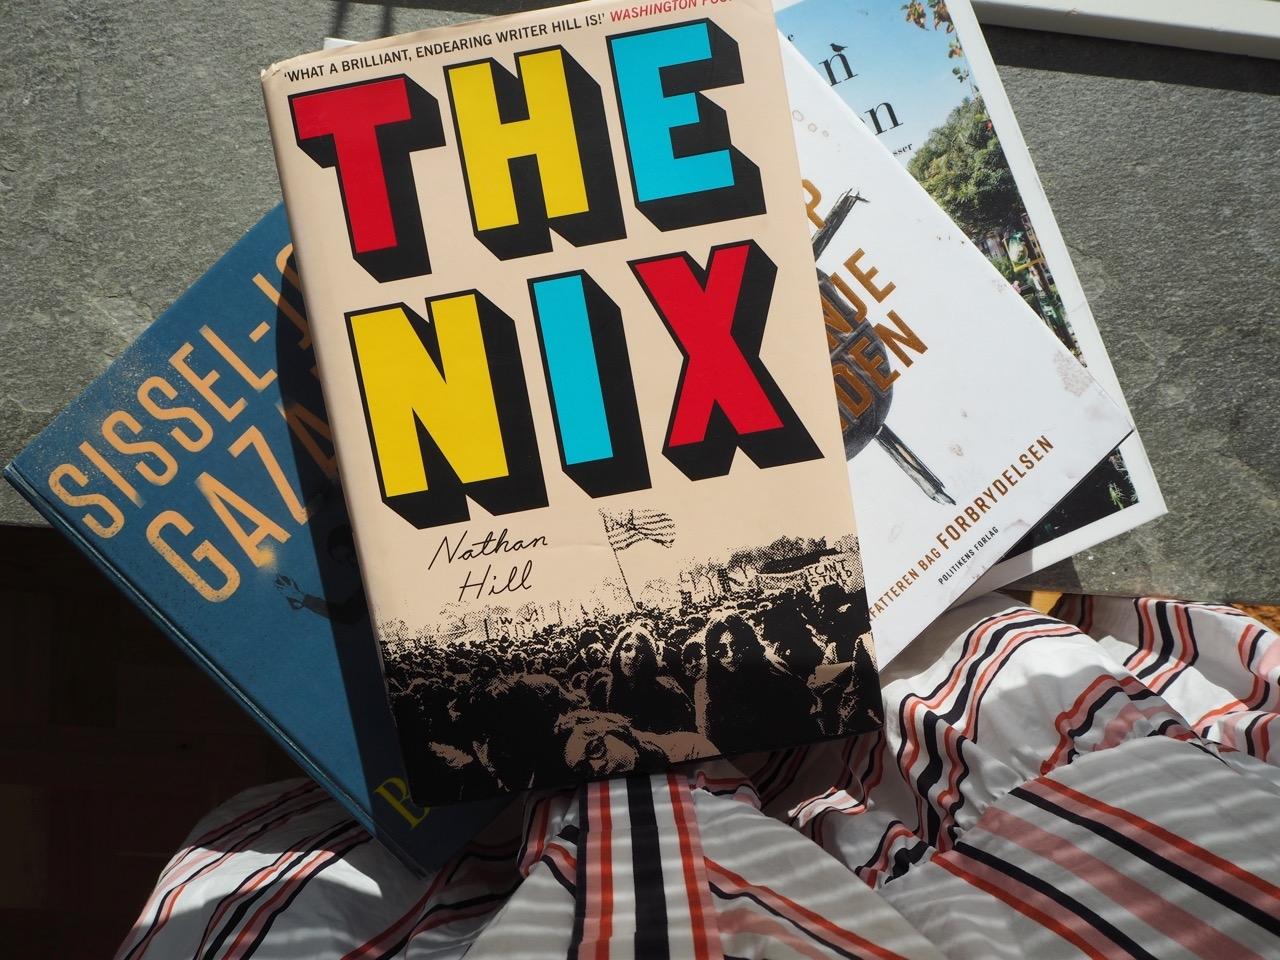 The_nix_nathan_hill